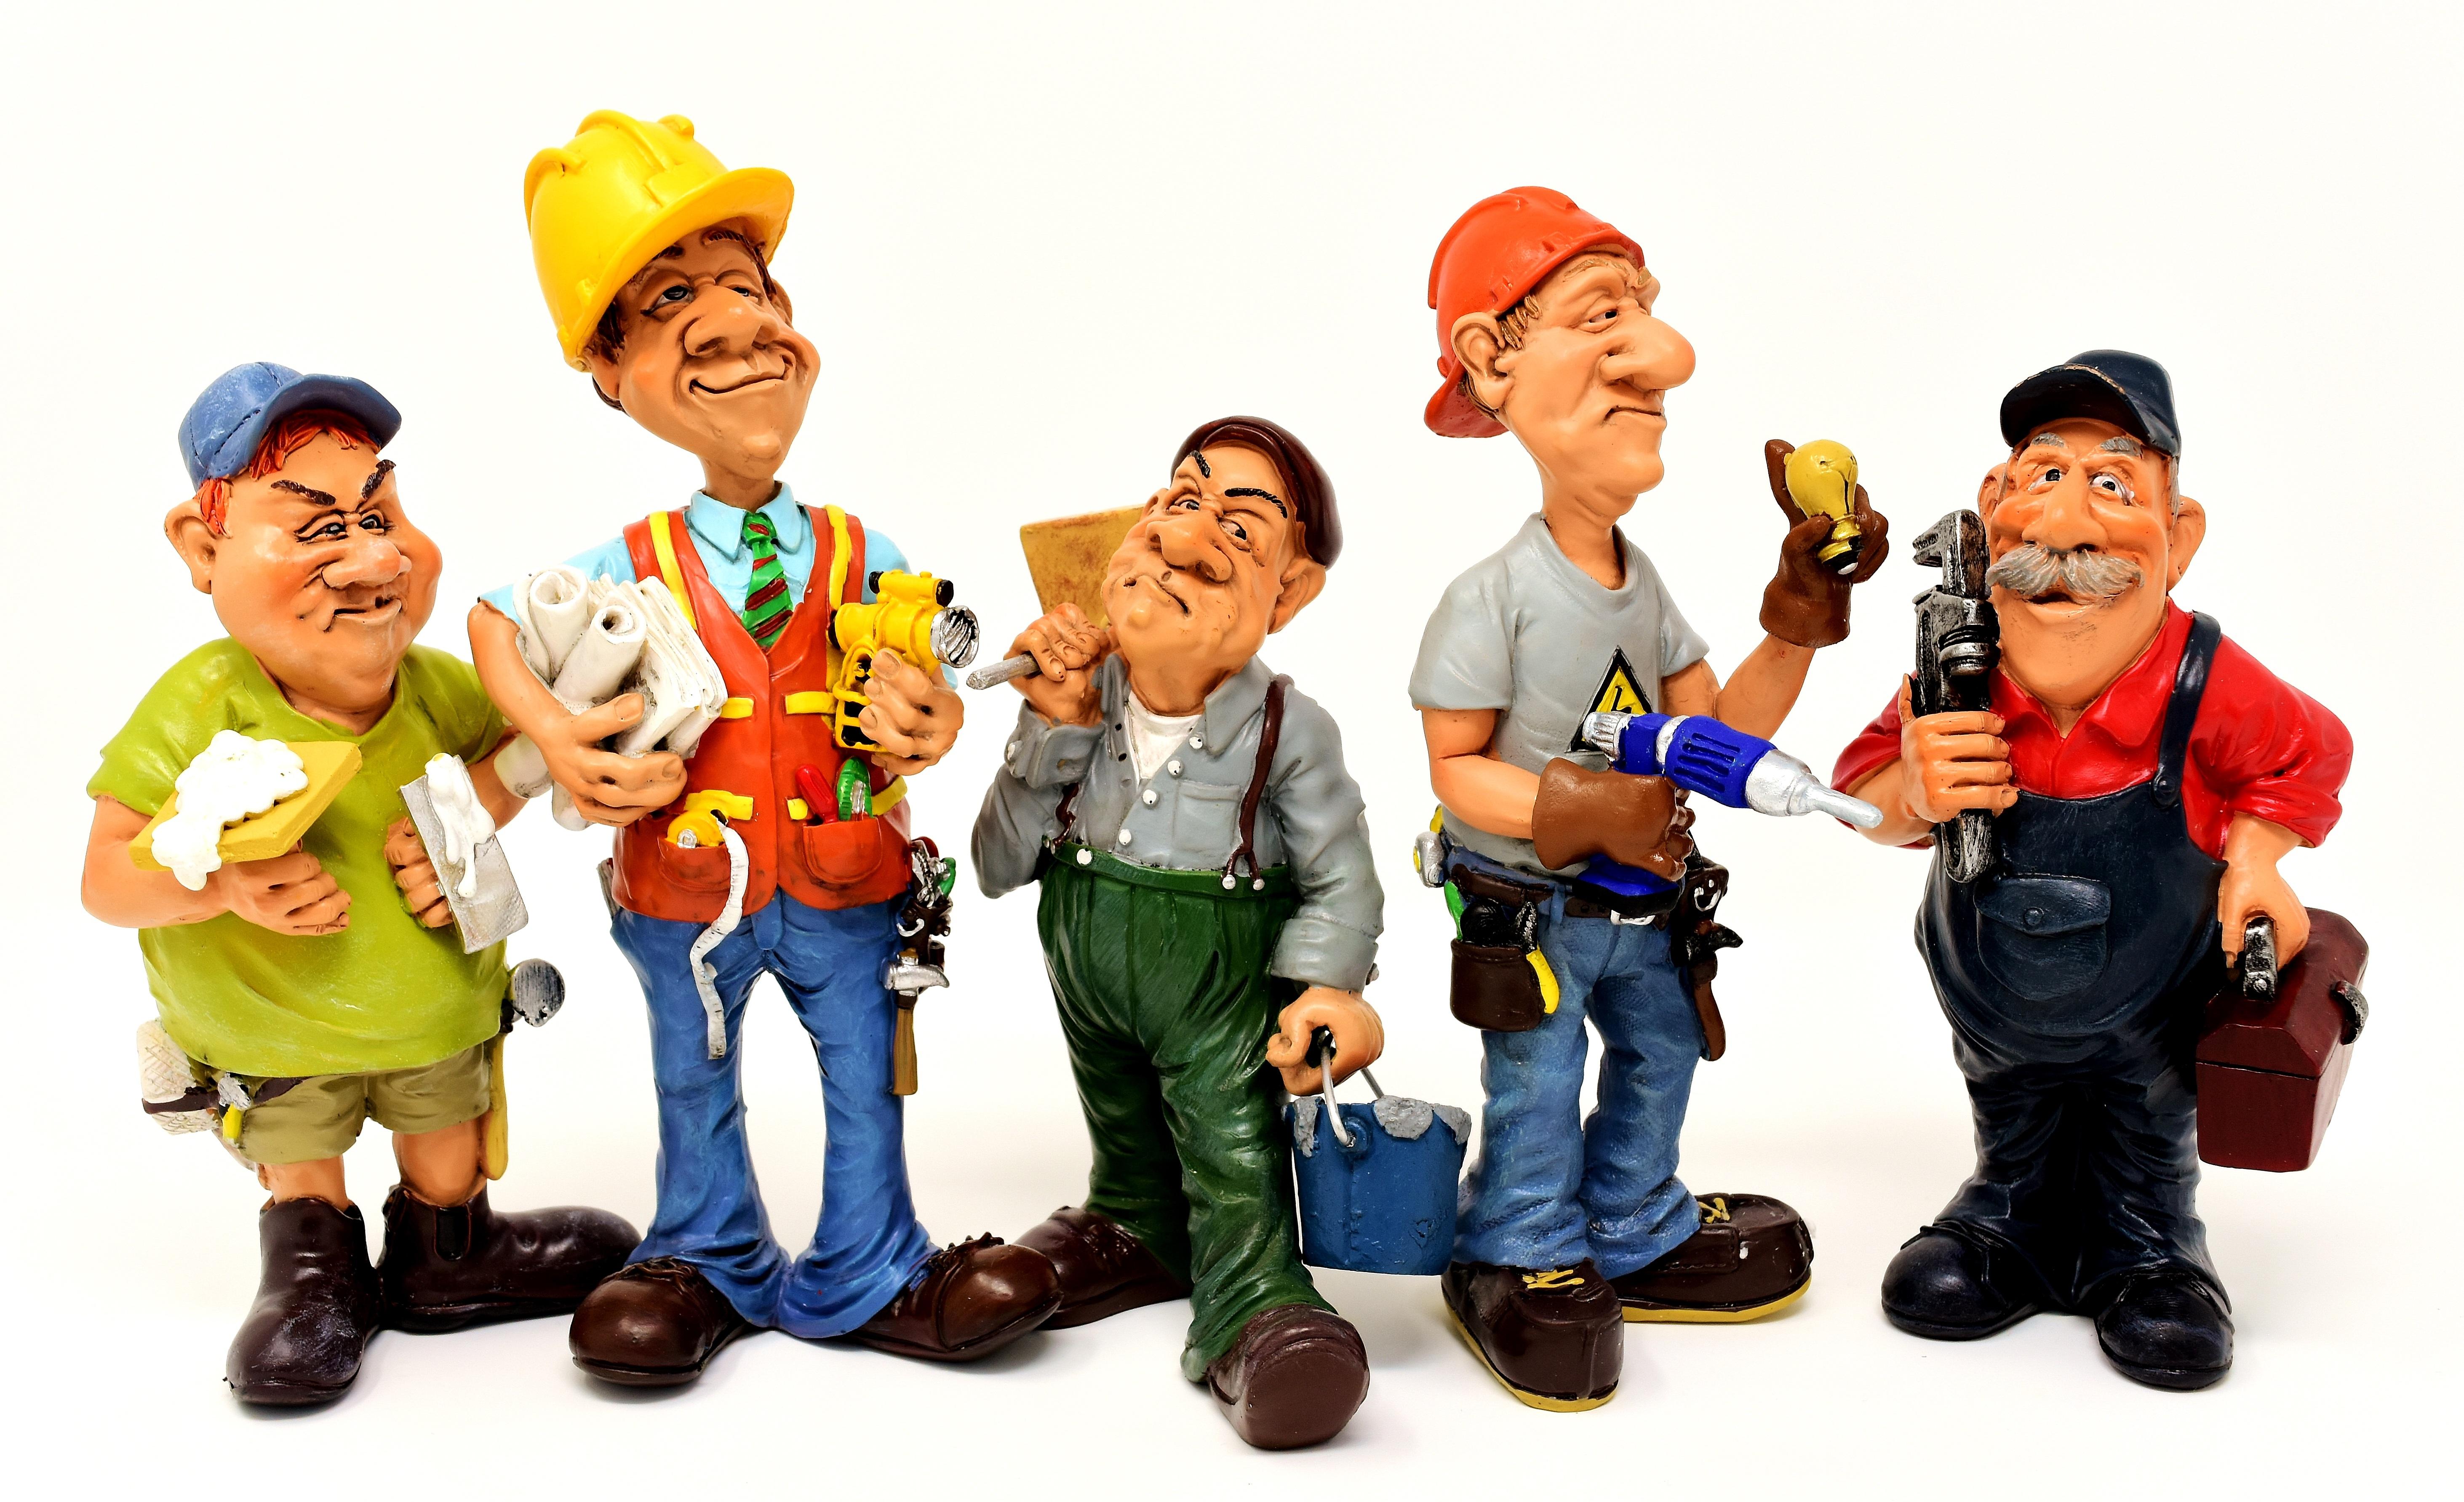 craftsmen-3094035